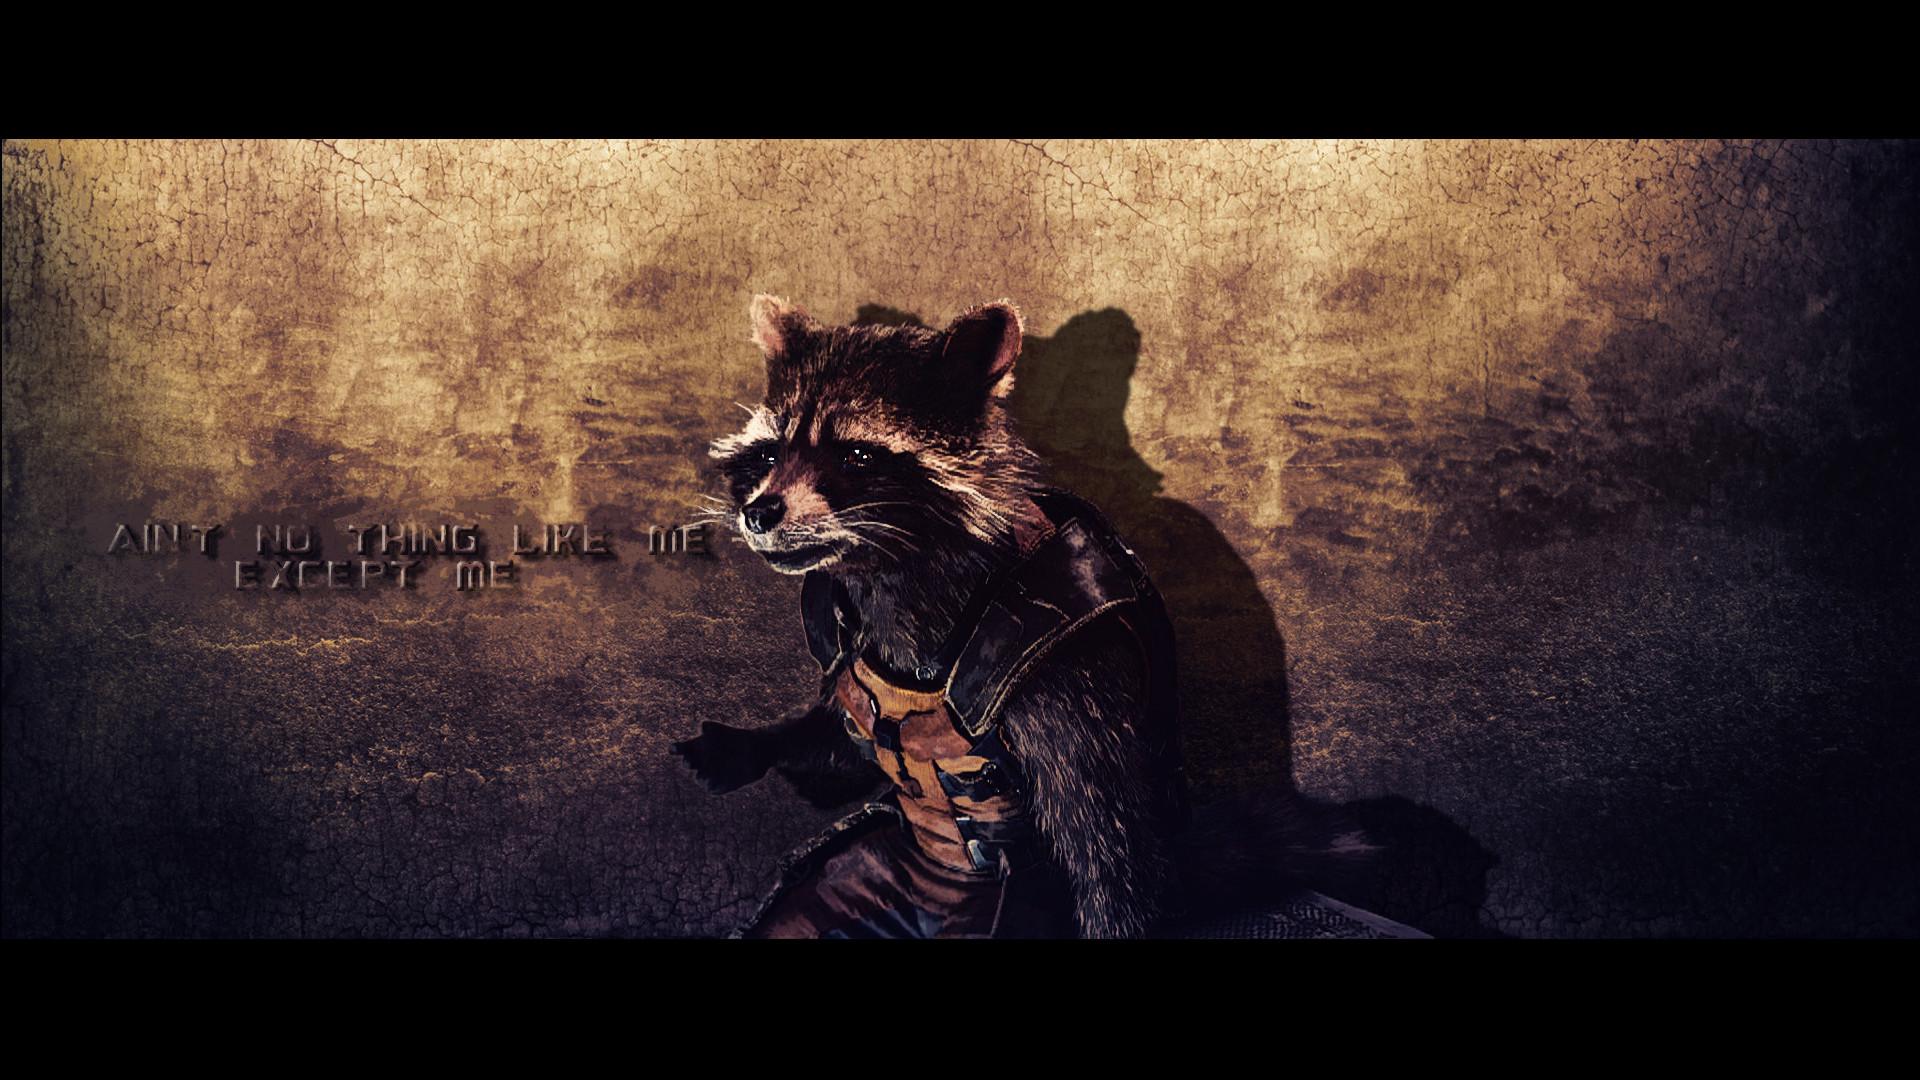 Hd rocket raccoon wallpaper 67 images - Rocket raccoon phone wallpaper ...